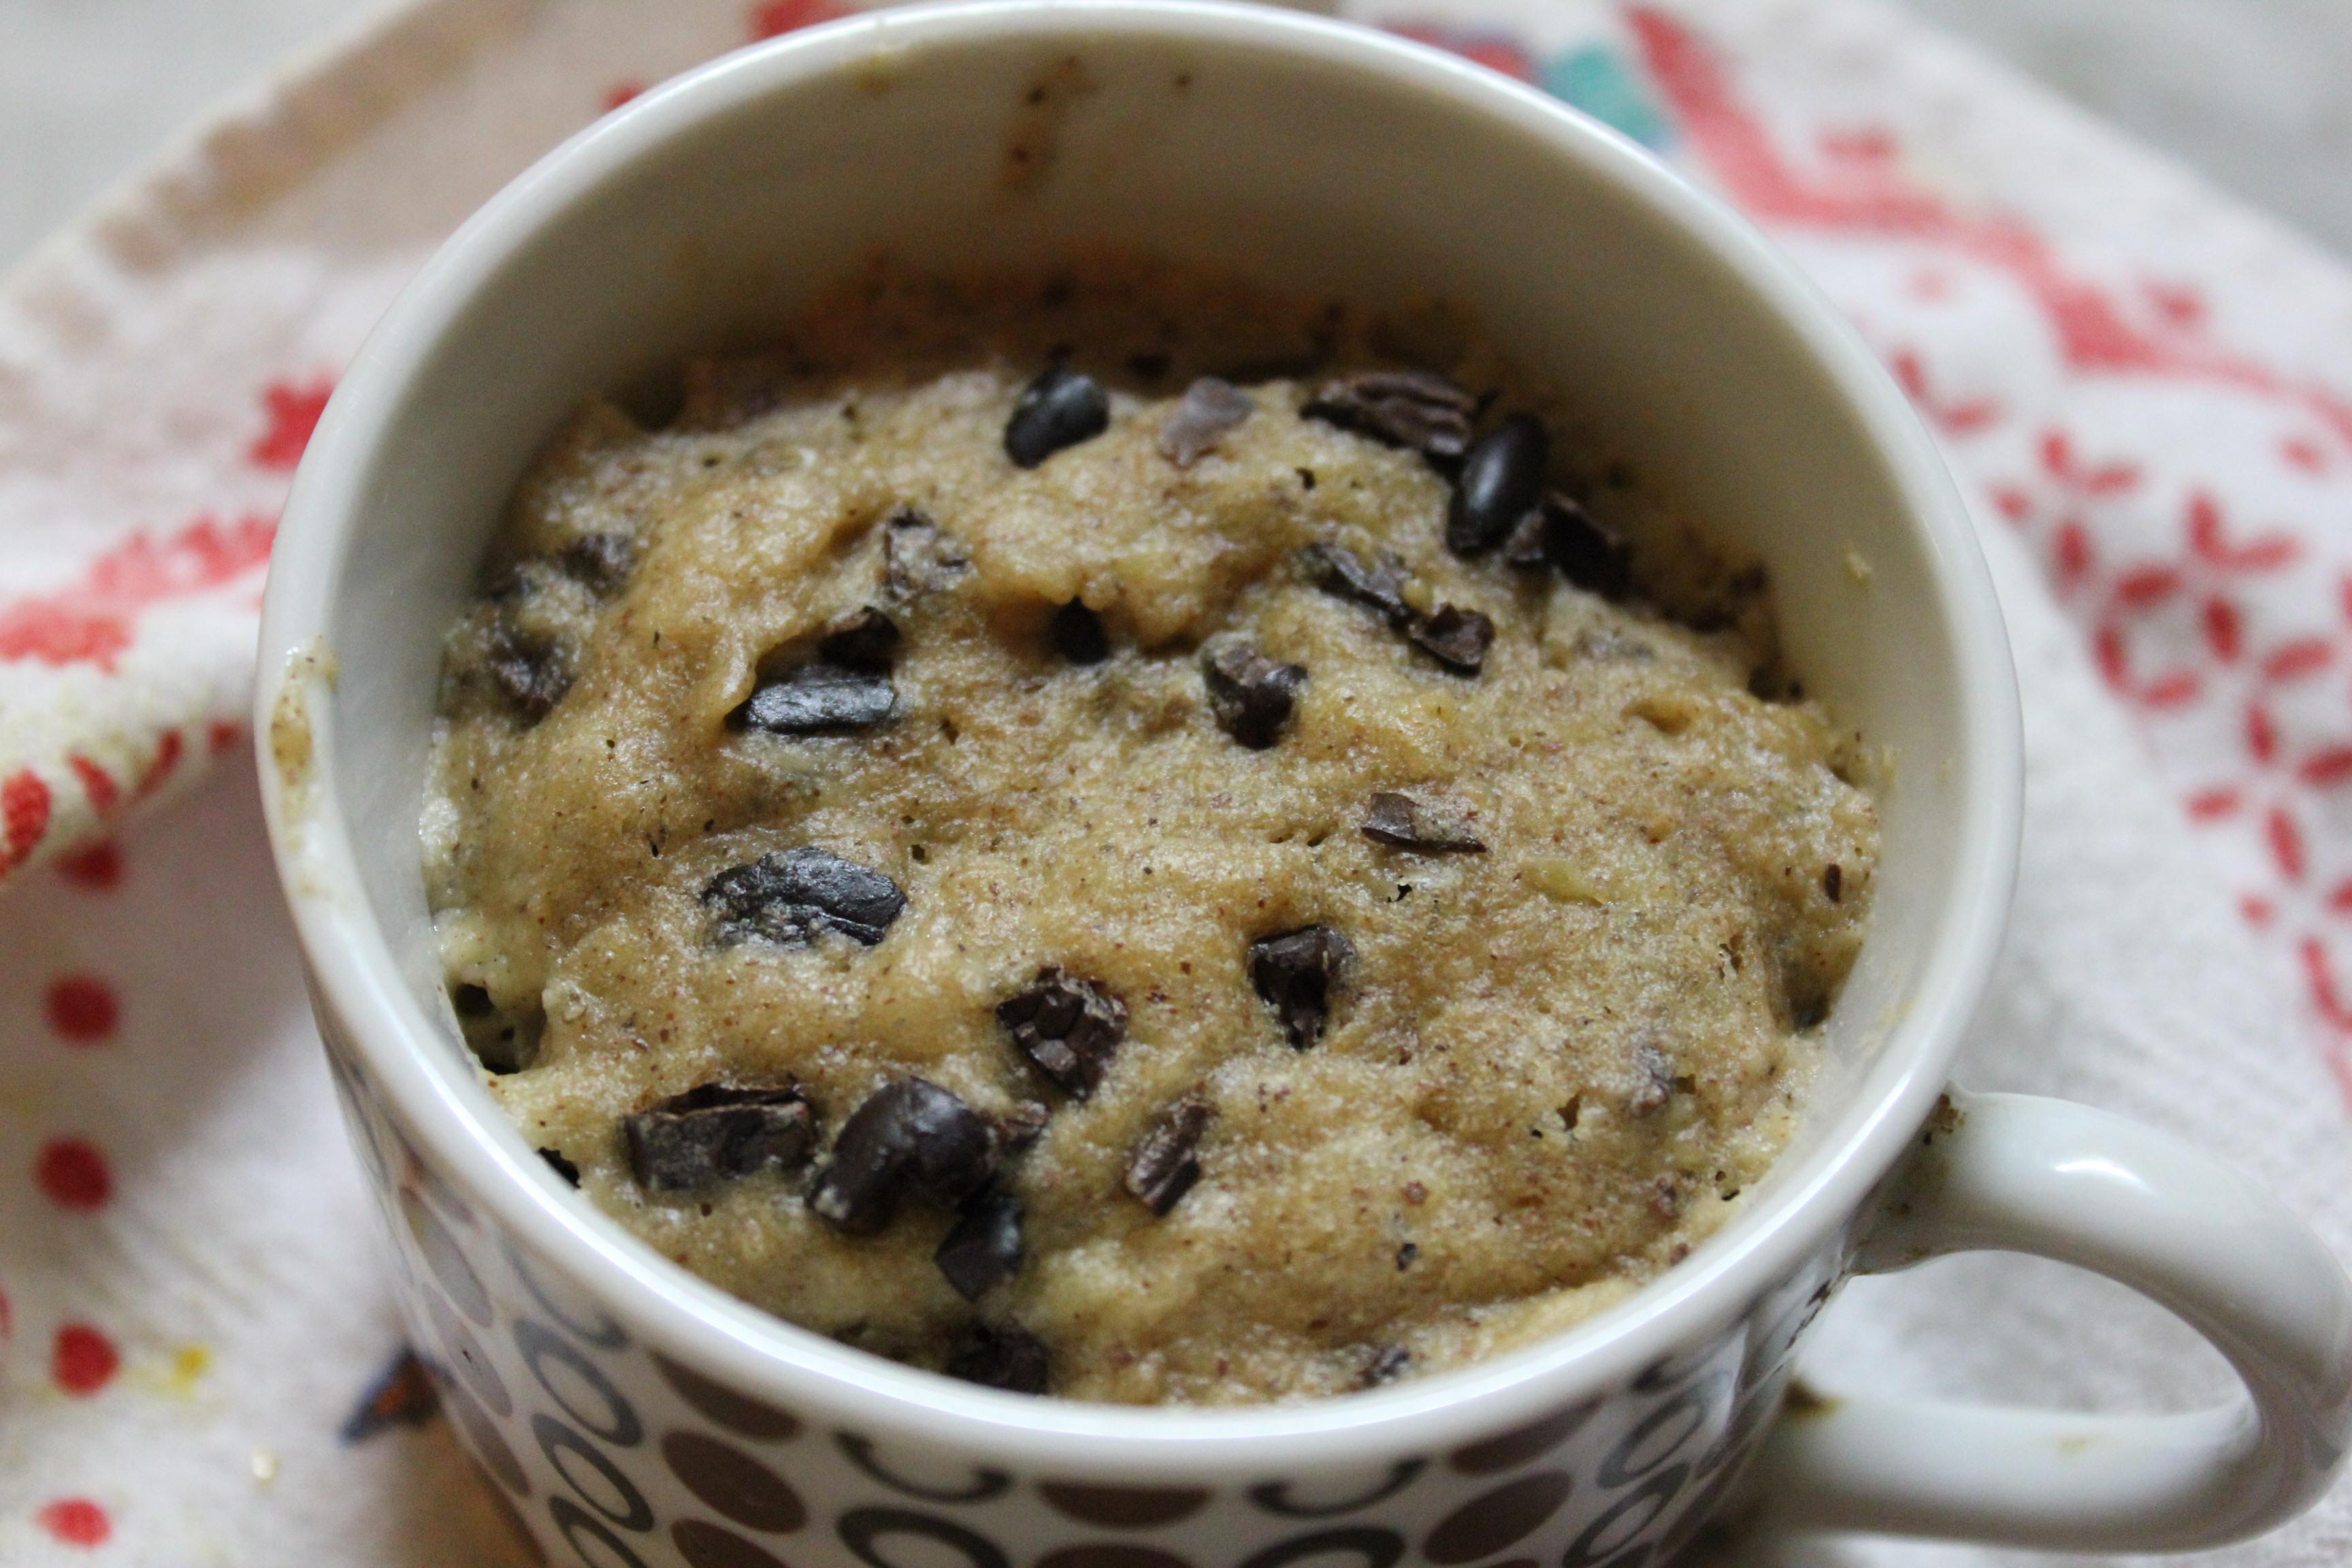 Cookie Dough Mug Muffin Gluten Free Vegan Sugar Free My Little Jar Of Spices